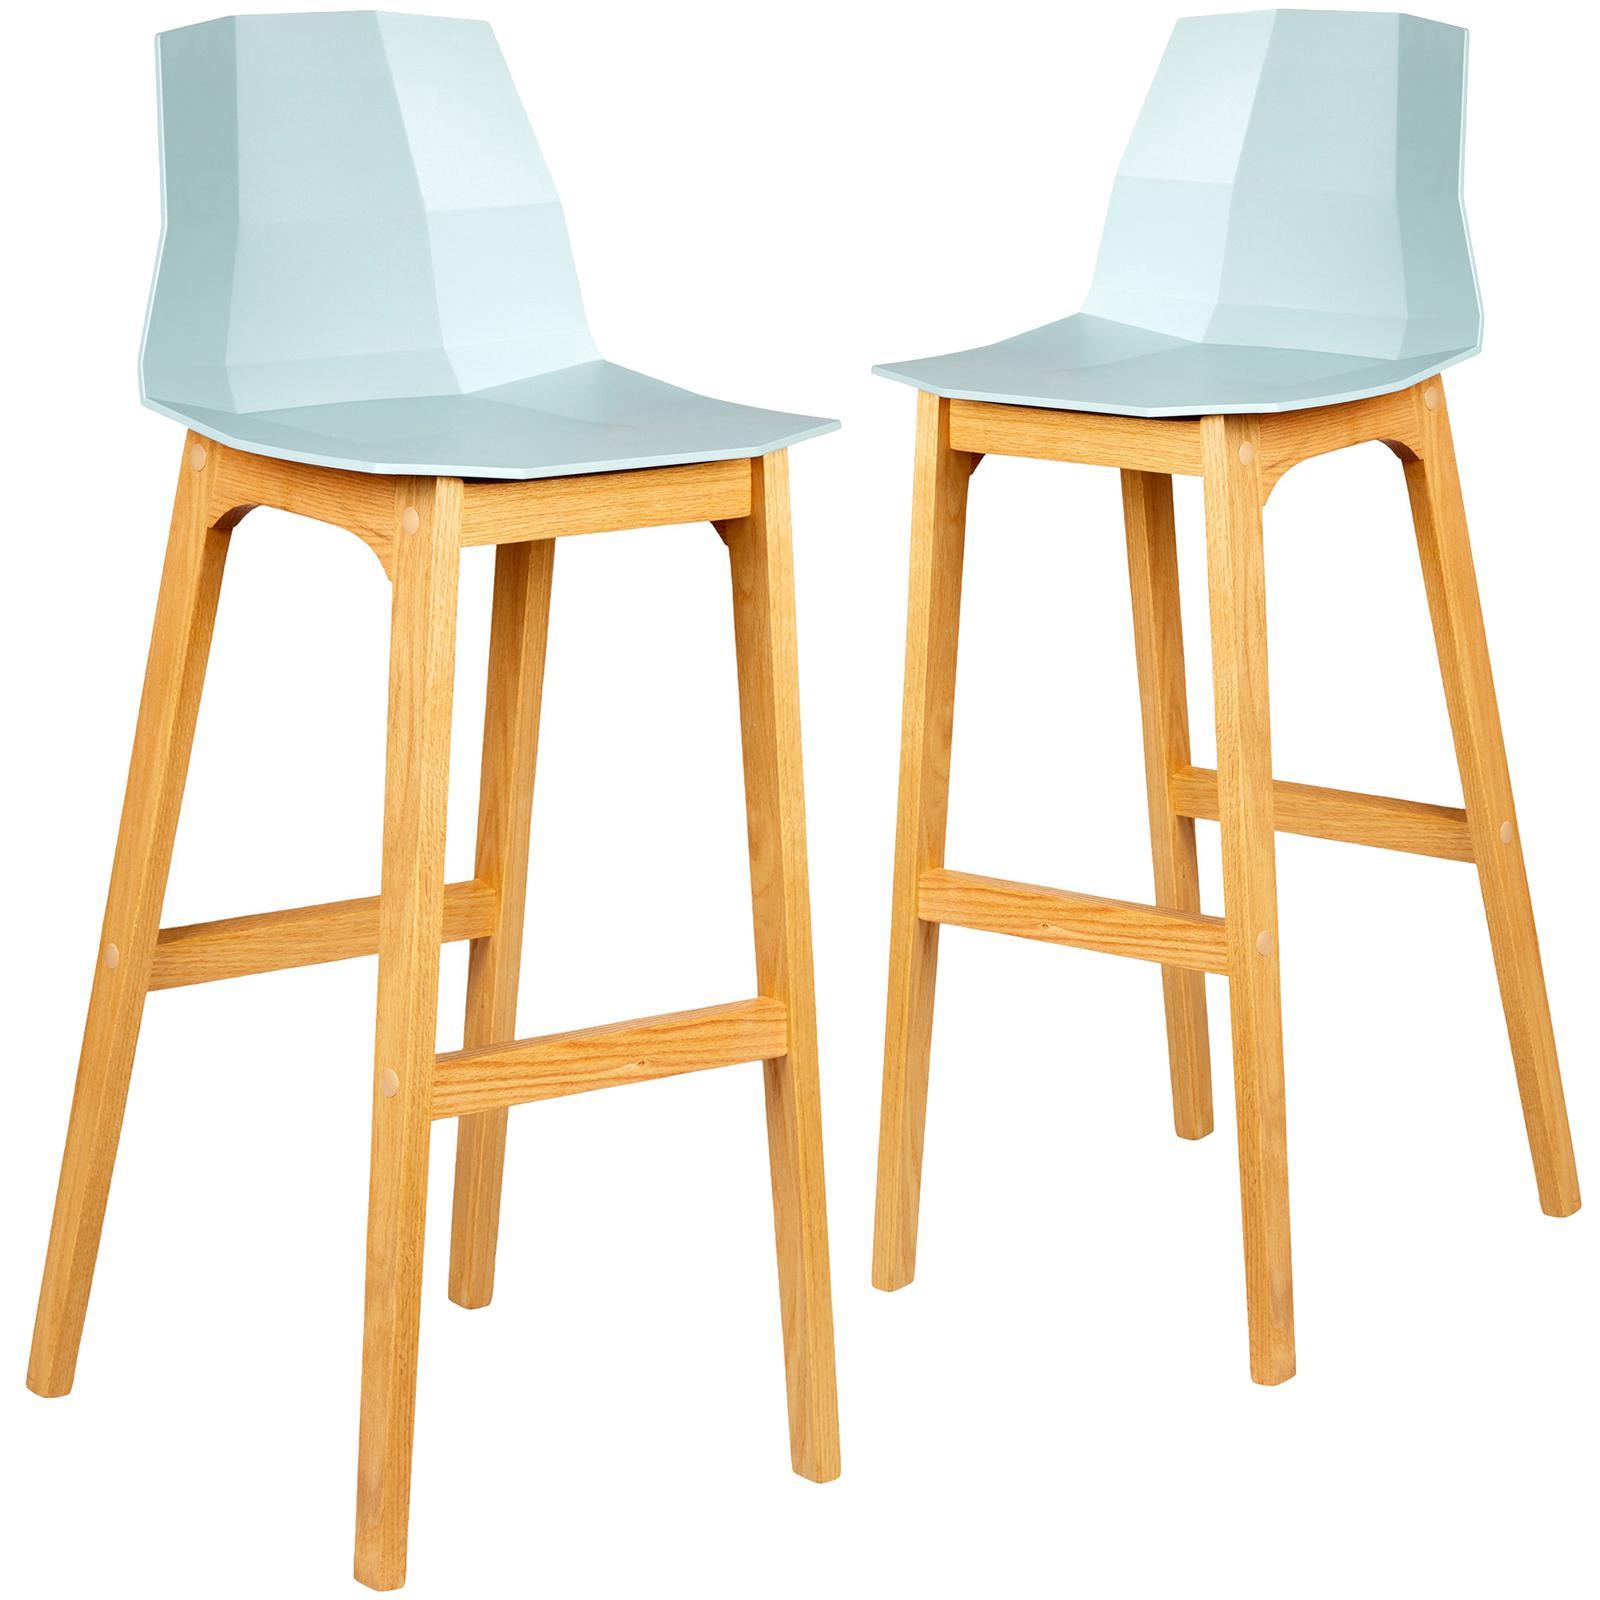 Image of: Set Of 2 Hayley Low Back Modern Kitchen Bar Stool Chair Dining Barstools Matt Blatt